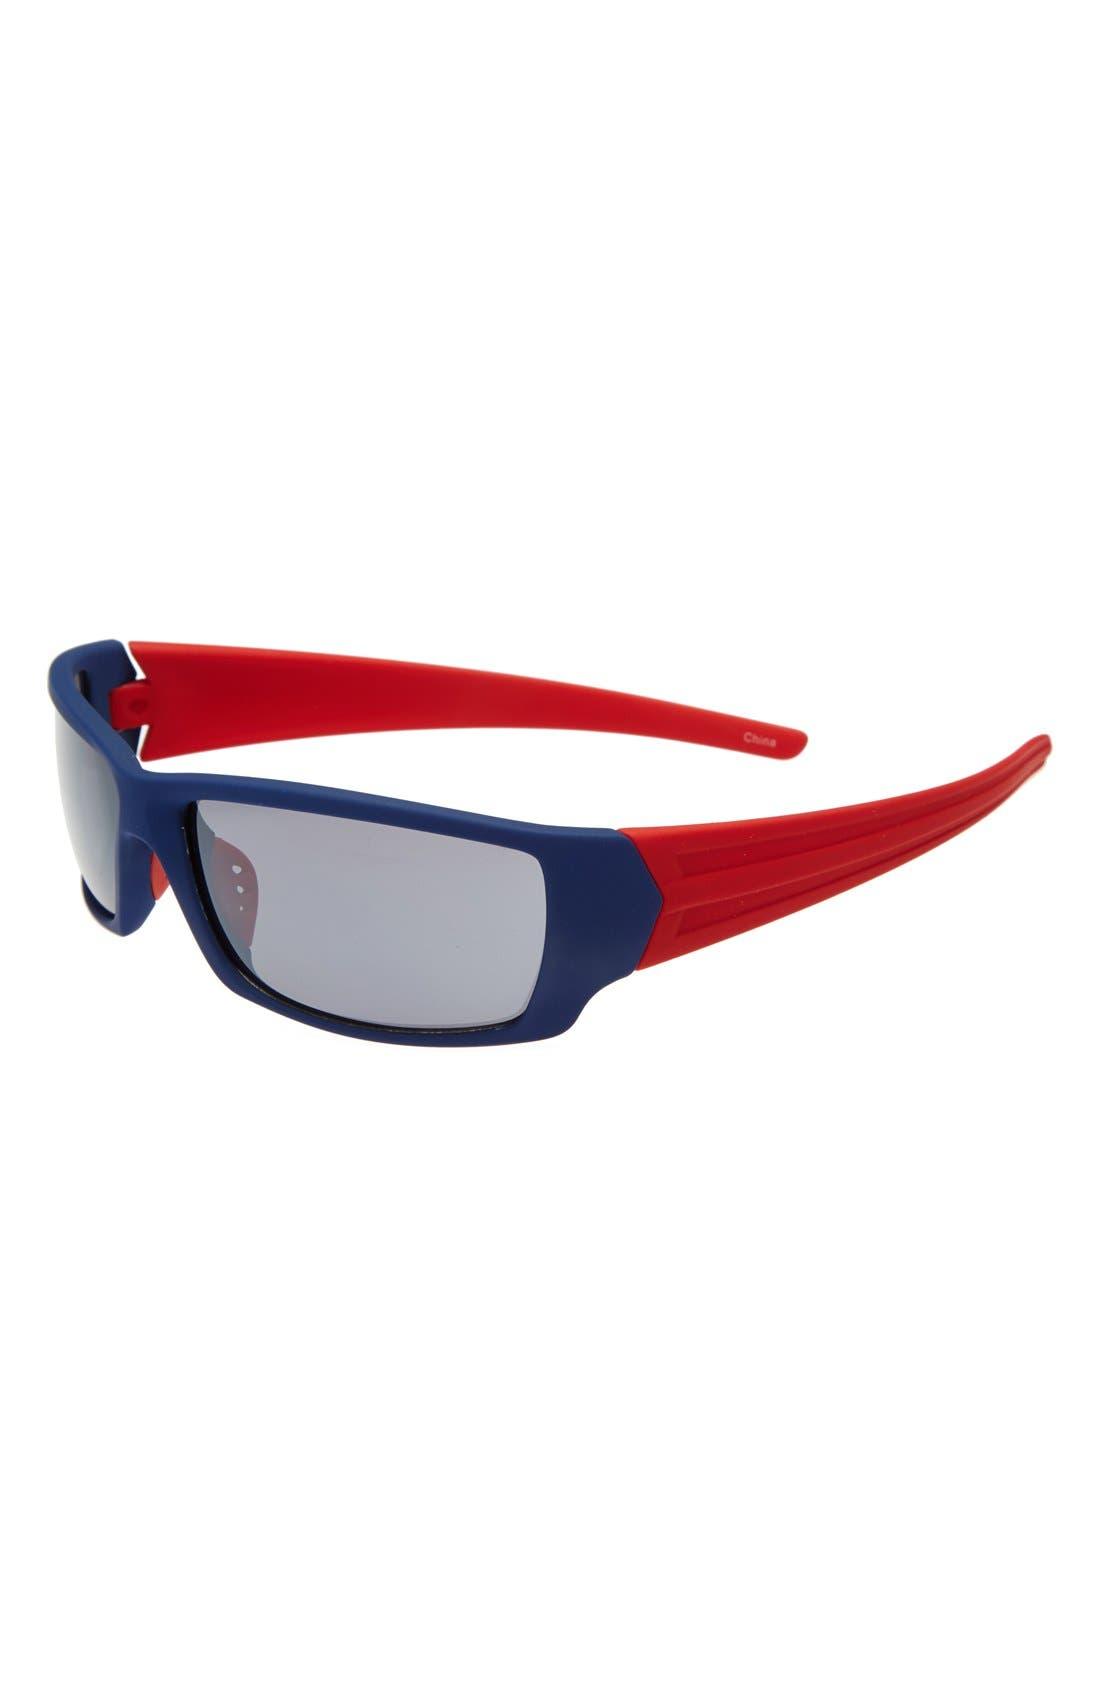 Alternate Image 1 Selected - Icon Eyewear 'Hugh' Two-Tone Rubberized Sunglasses (Boys)